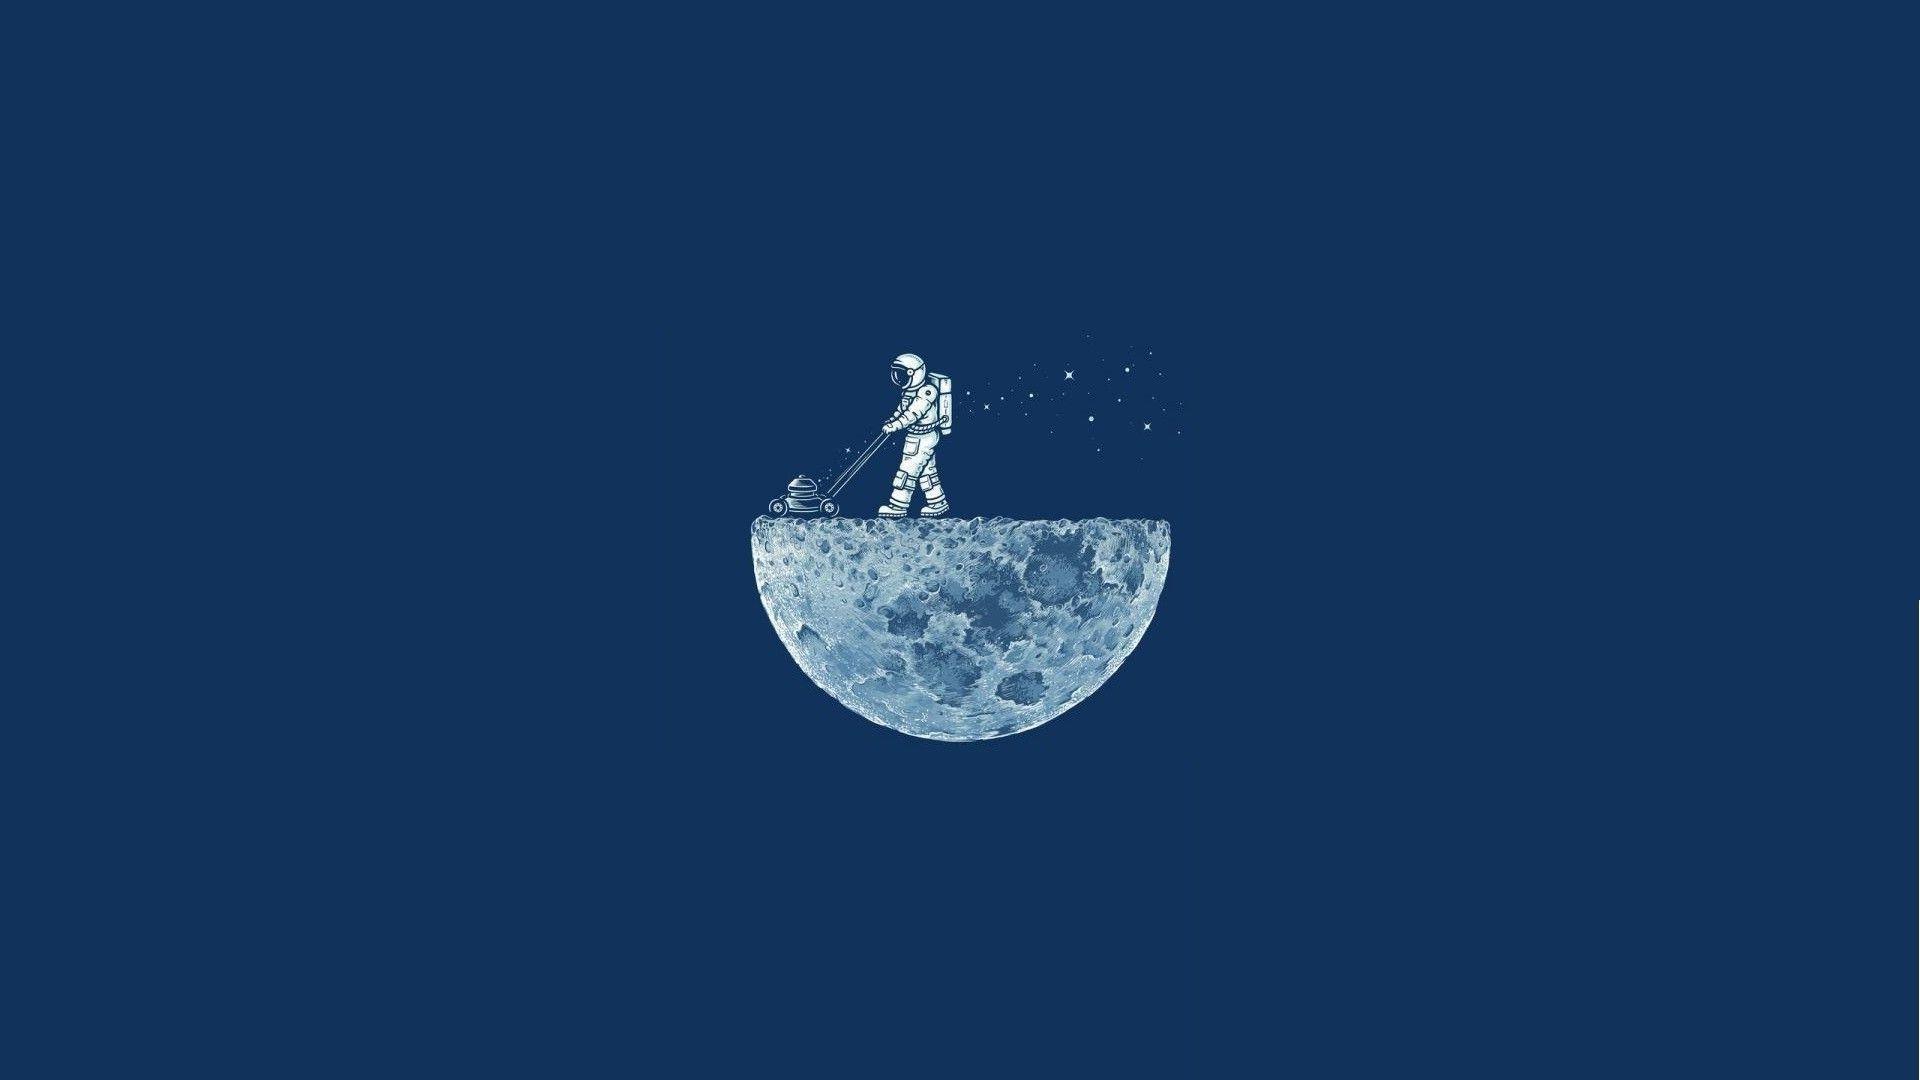 Minimalist Astronaut Wallpapers Top Free Minimalist Astronaut Backgrounds Wallpaperaccess